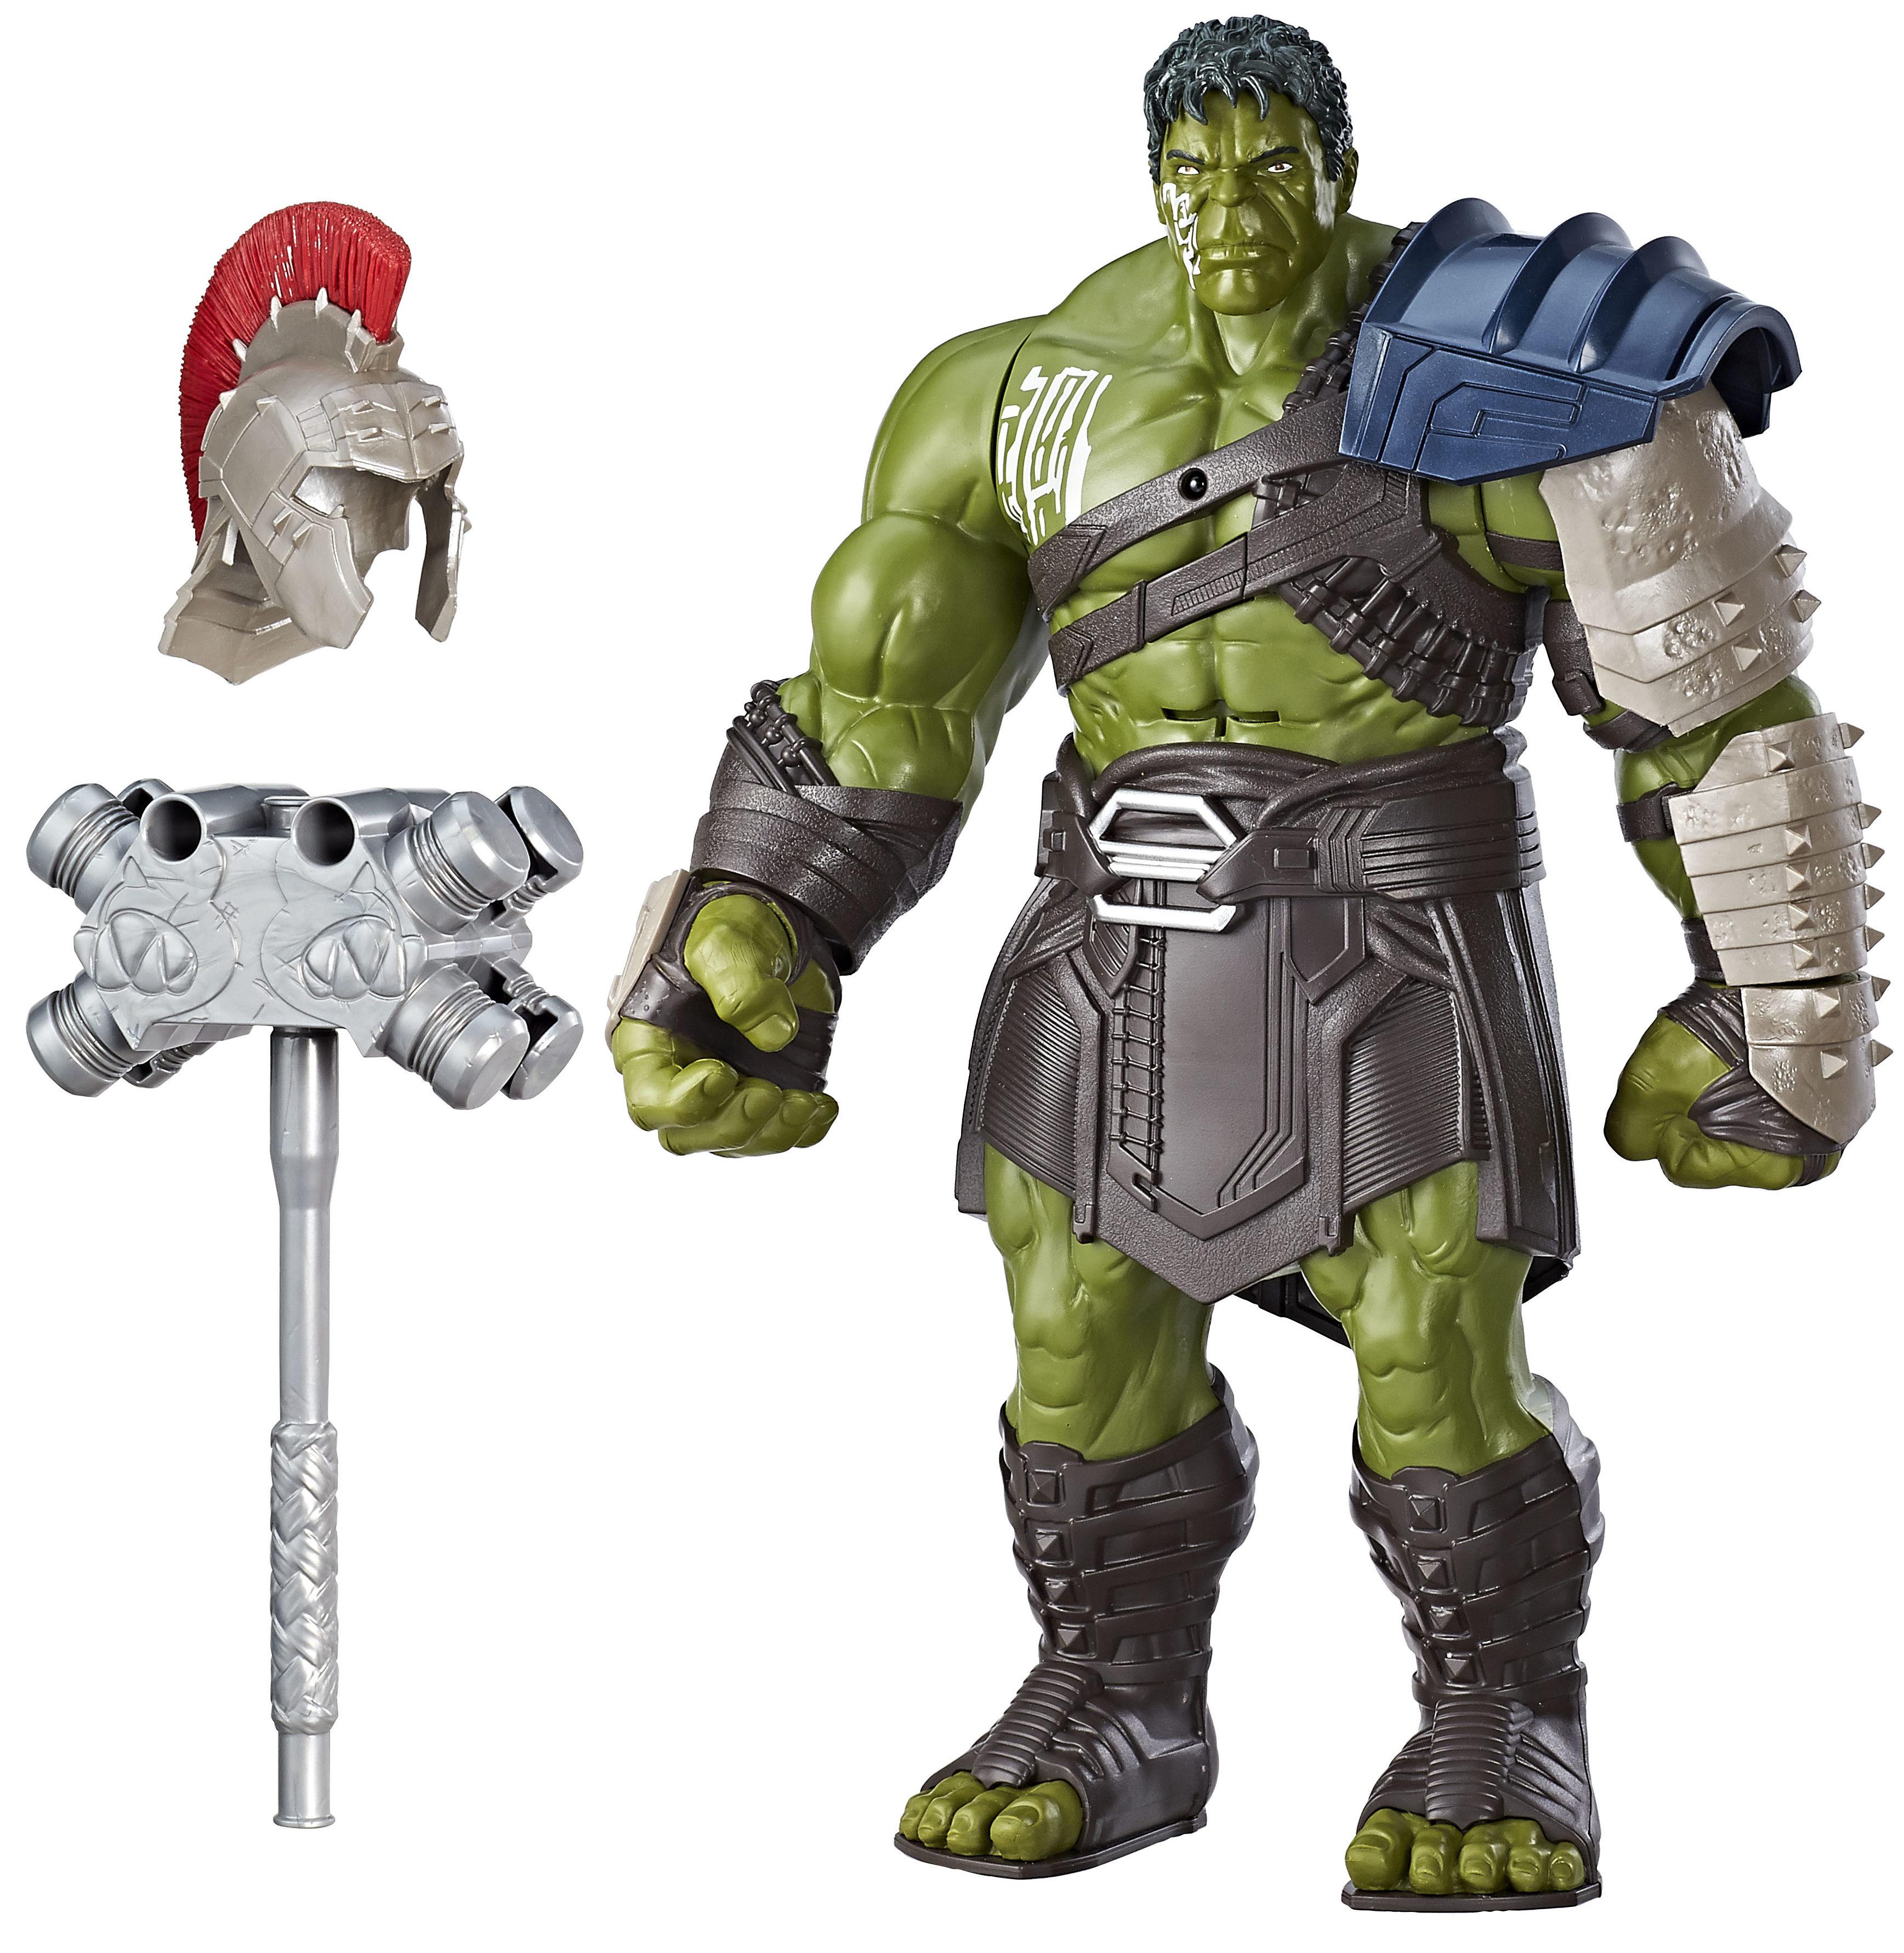 Hasbro Thor Ragnarok Movie Figures & Toys Revealed ...